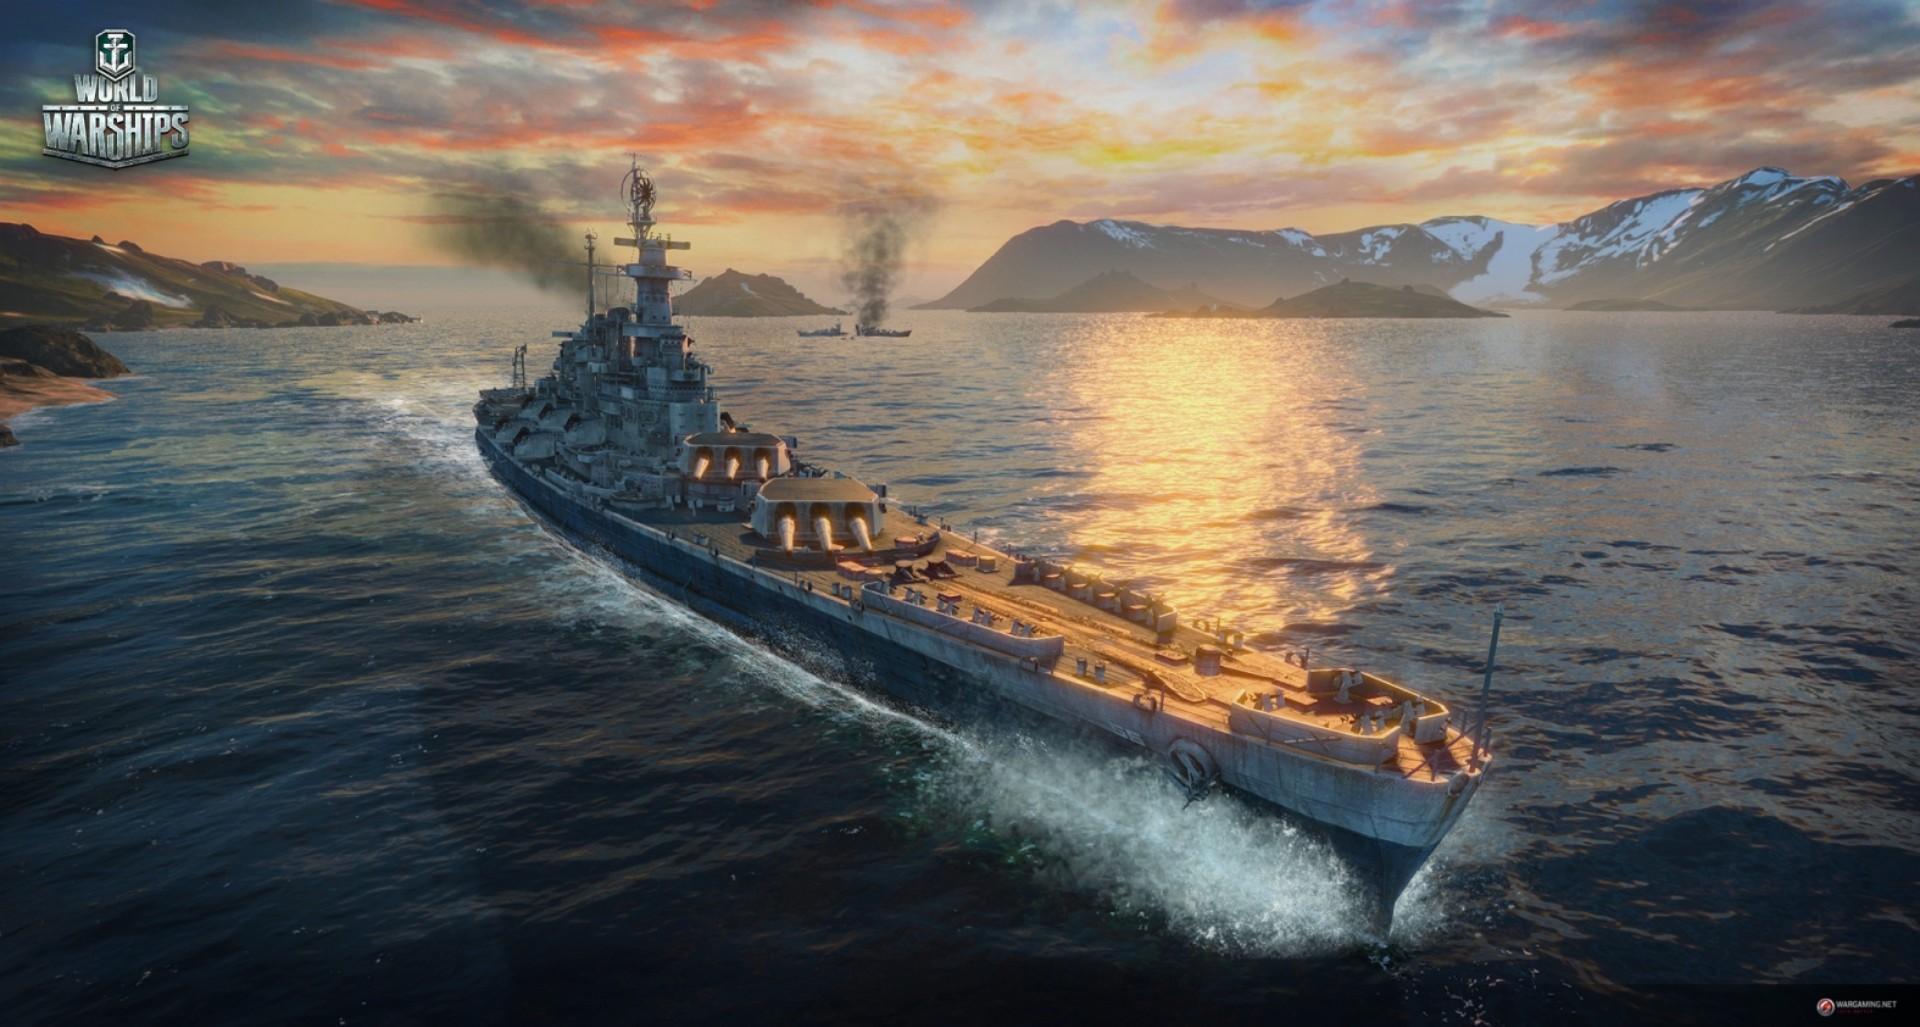 Скриншот World of Warships v0.5.5.2 №2